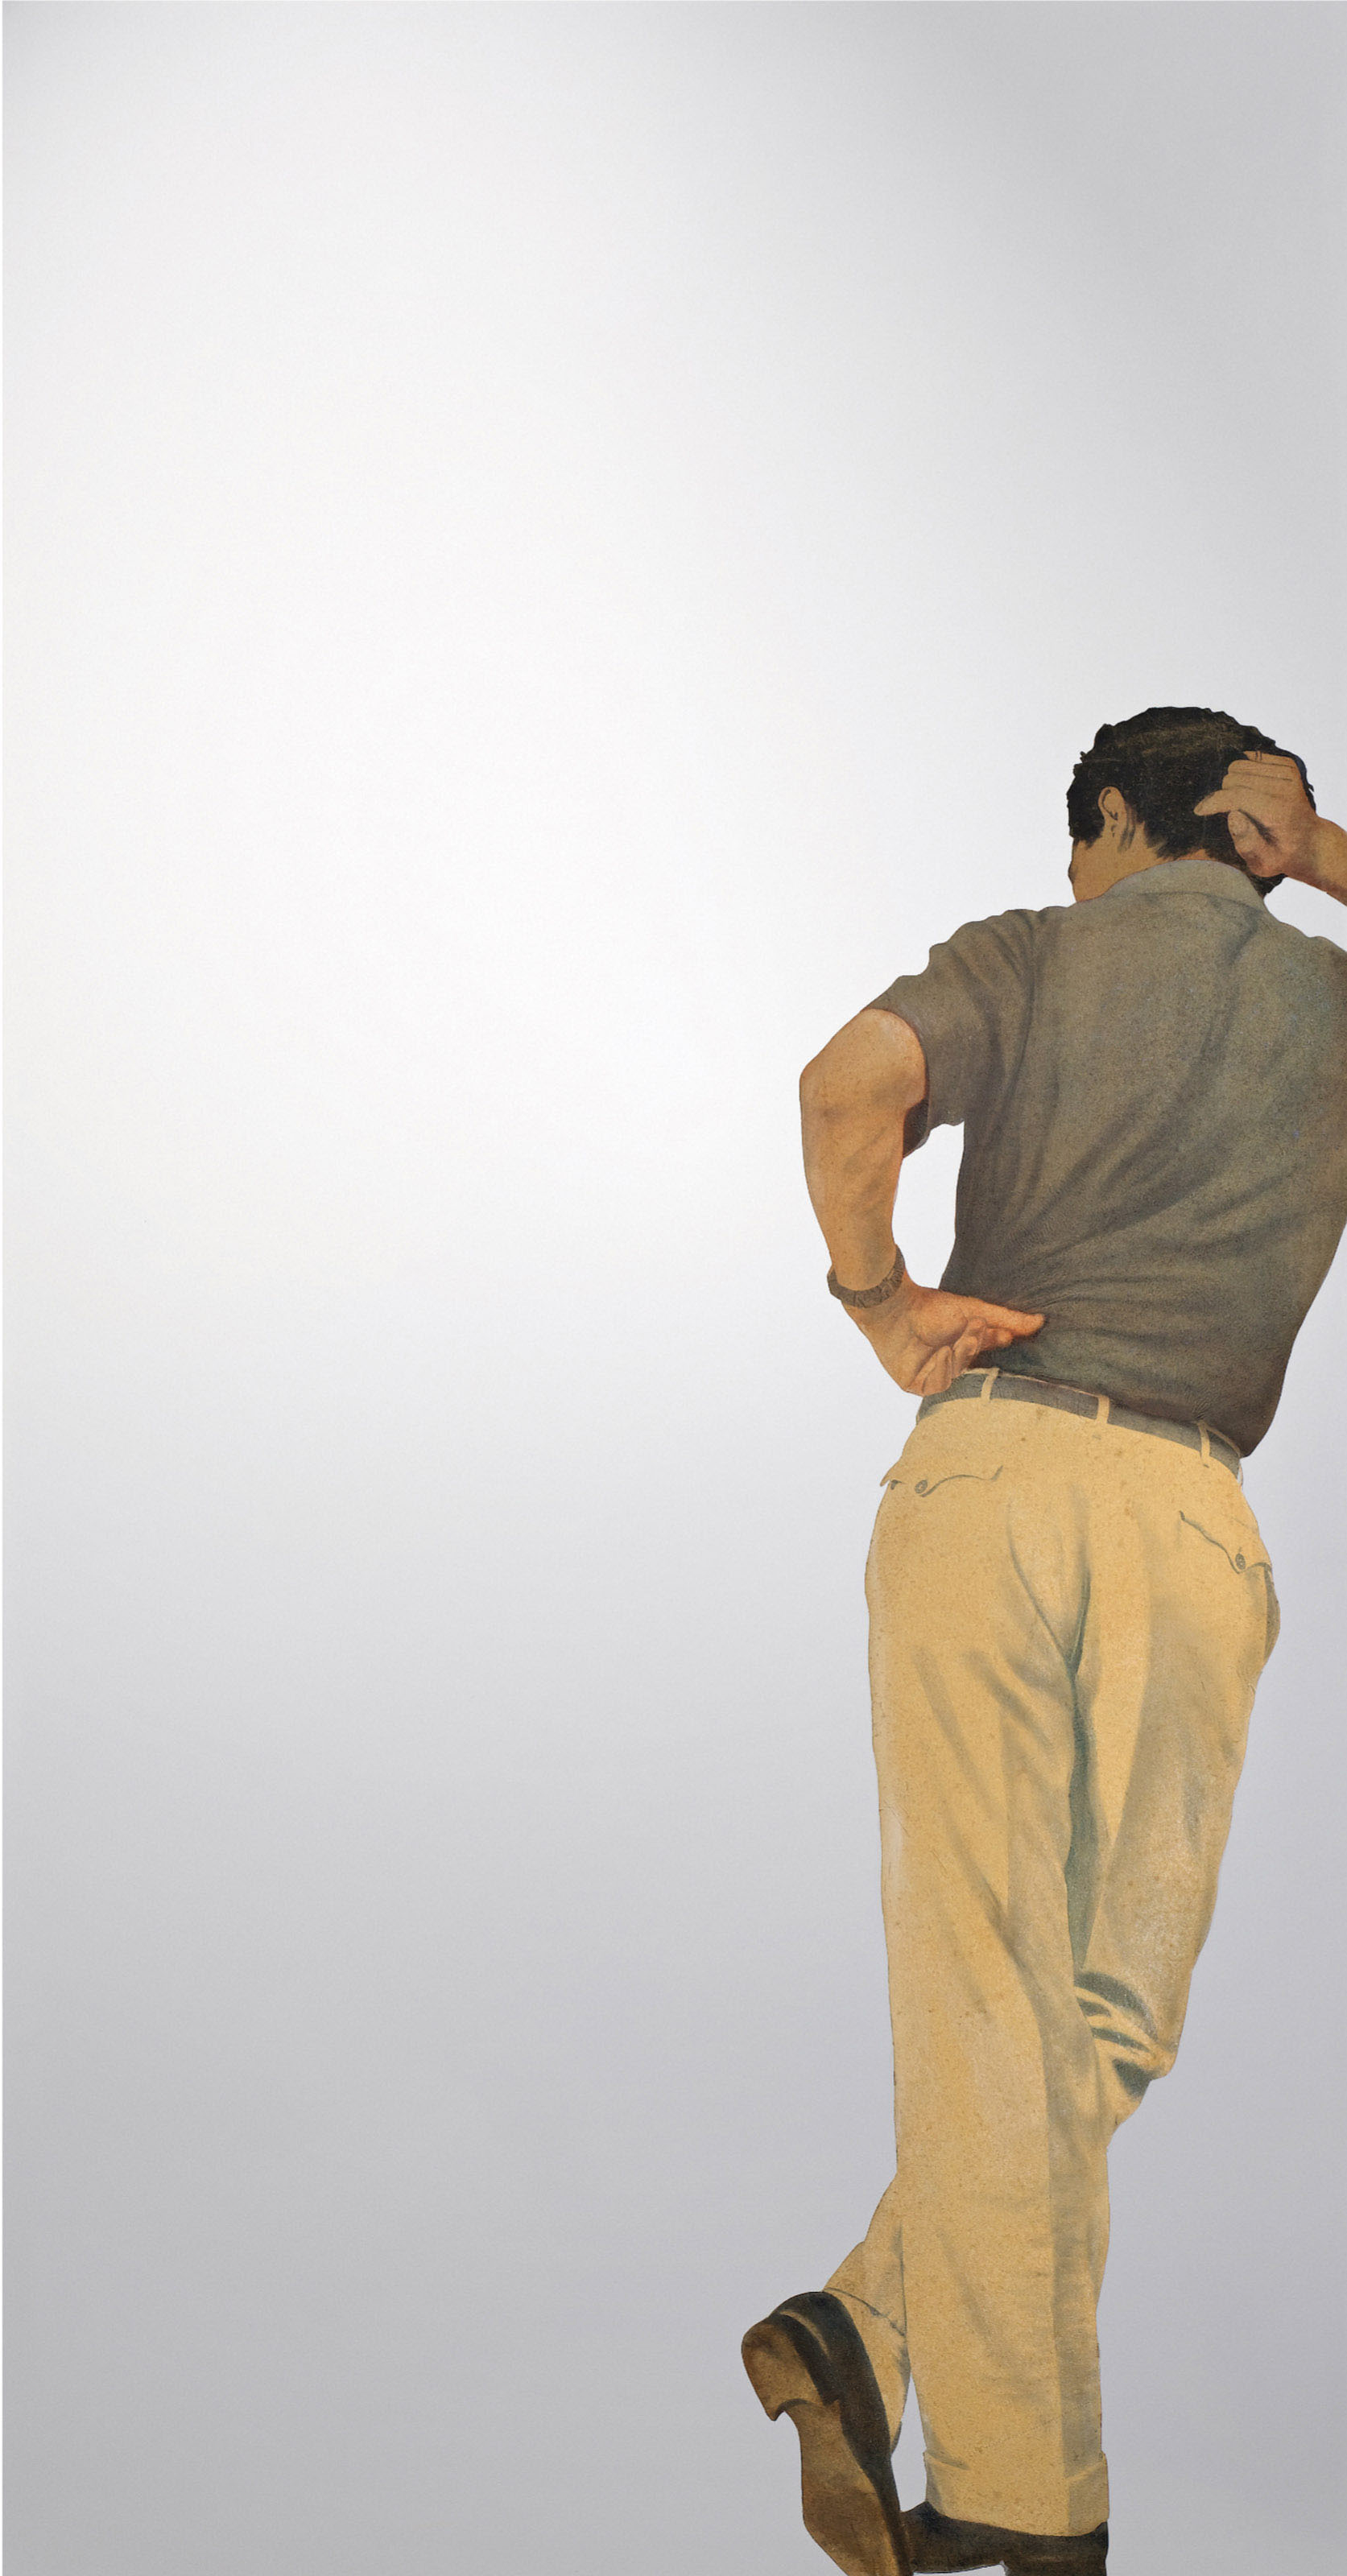 Uomo appoggiato (Leaning Man)